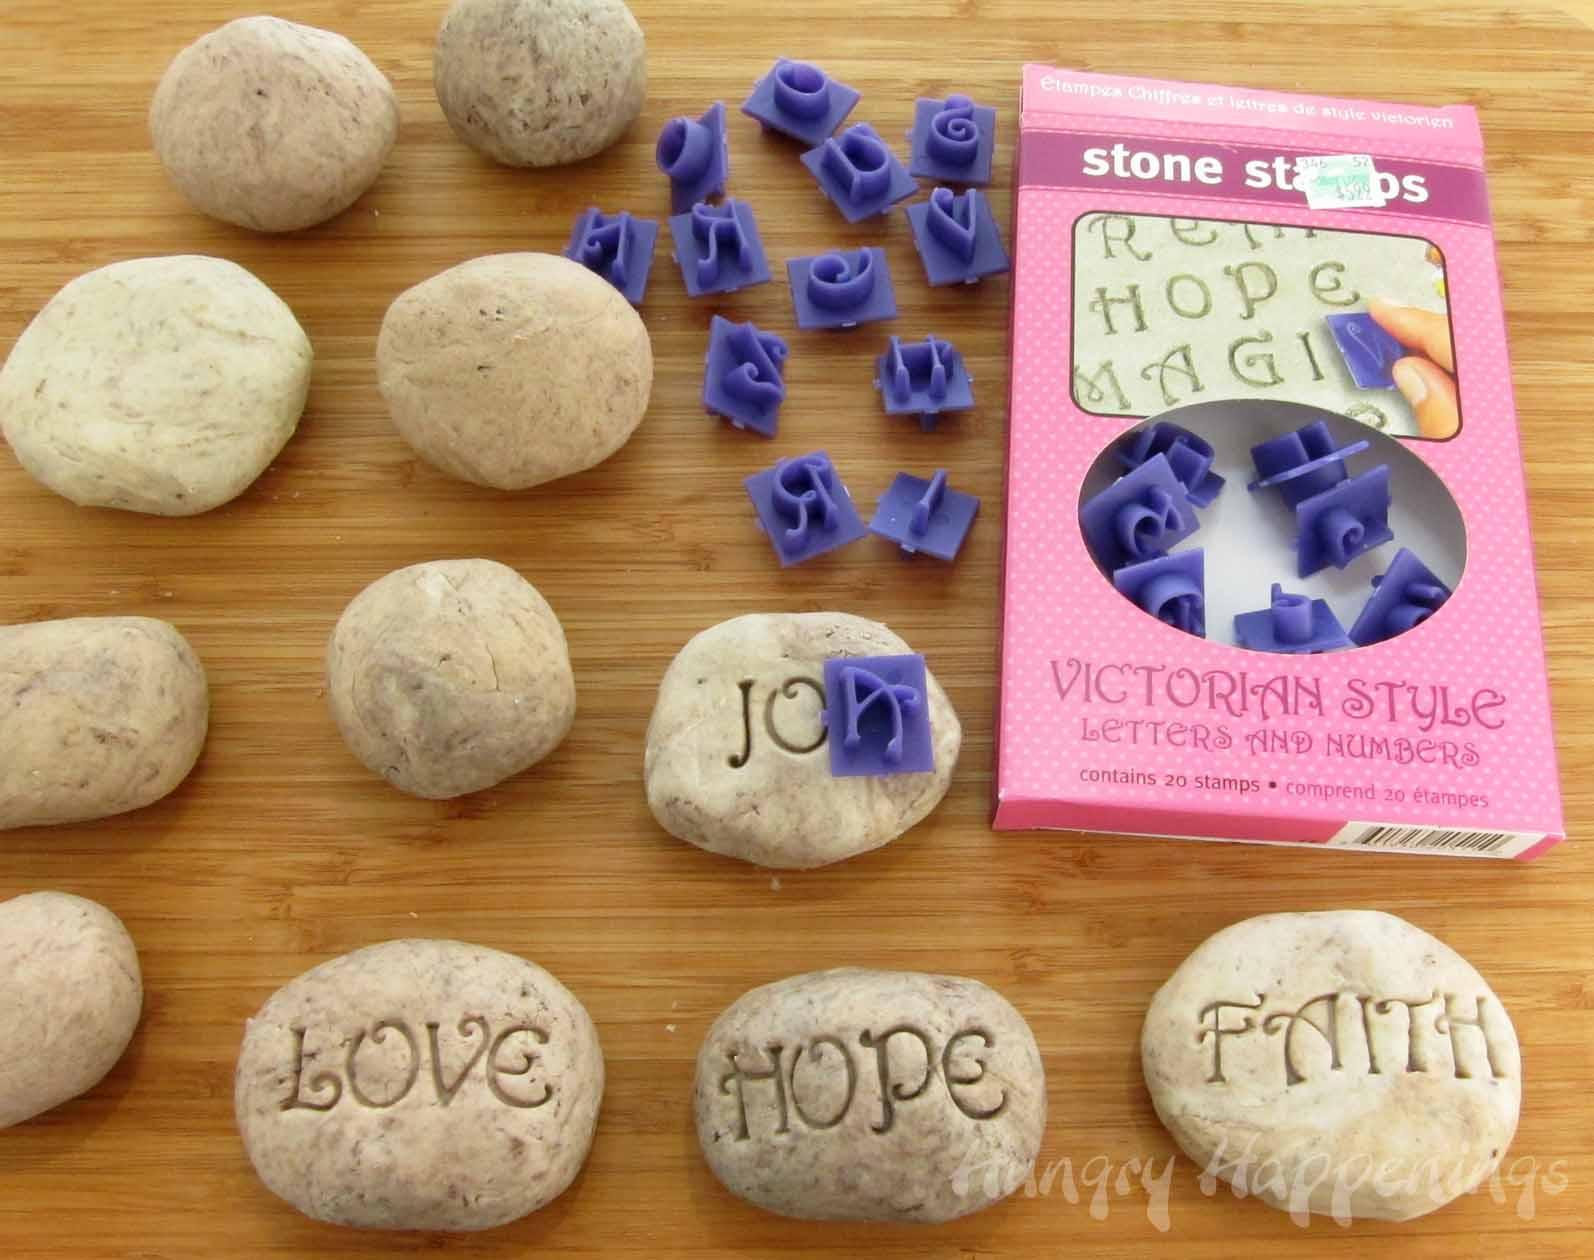 Fun teacher appreciation gifts edible fudge rocks for Crafts using stones